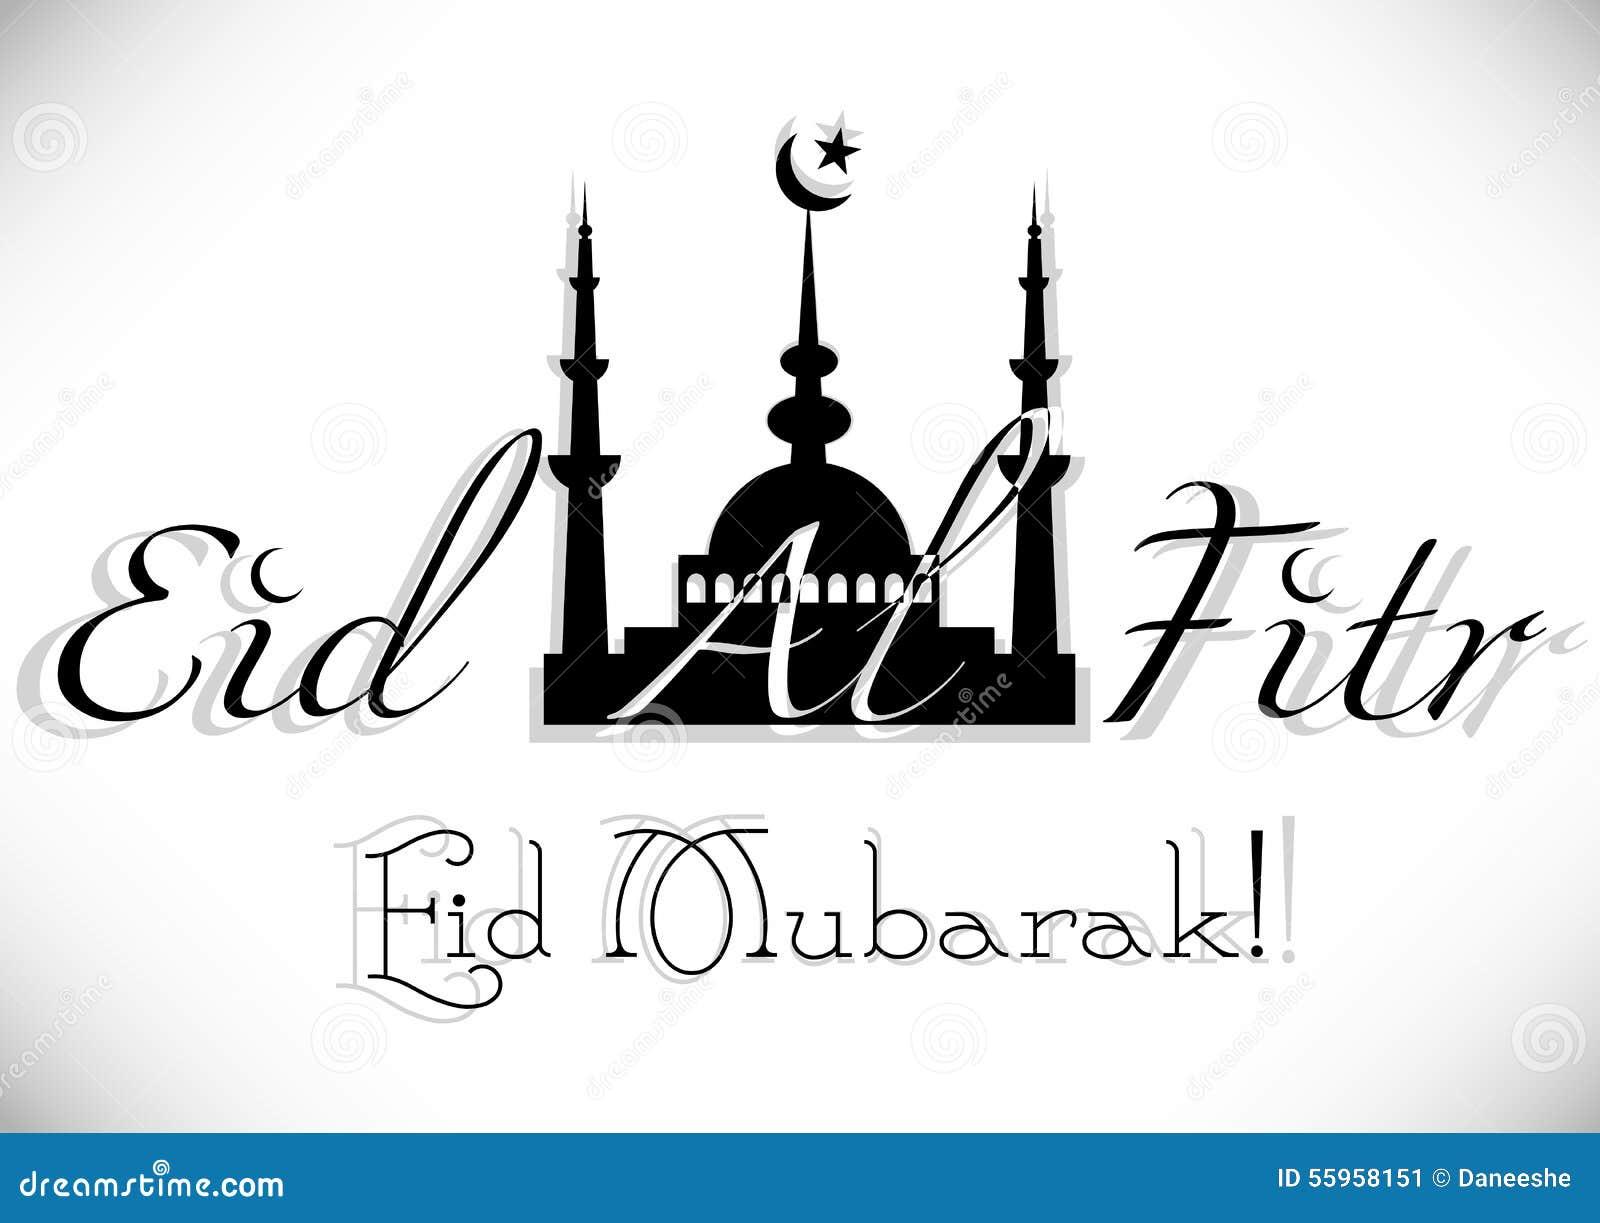 Beautiful Id Festival Eid Al-Fitr Greeting - card-greeting-islamic-feast-eid-al-fitr-white-finishing-fasting-month-ramadan-holiday-vector-illustration-55958151  Graphic_873947 .jpg